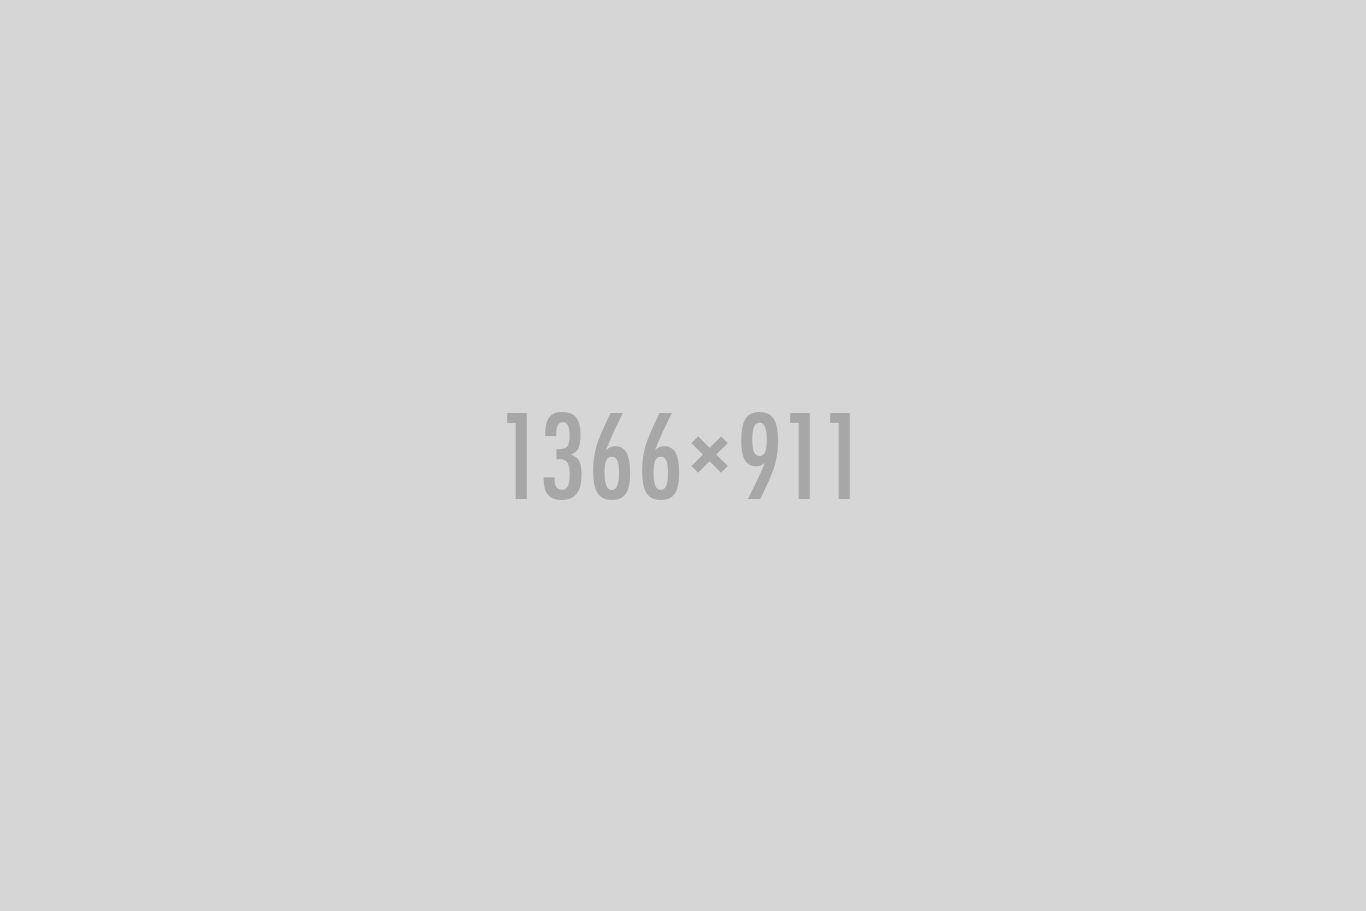 gallery-set13-image01